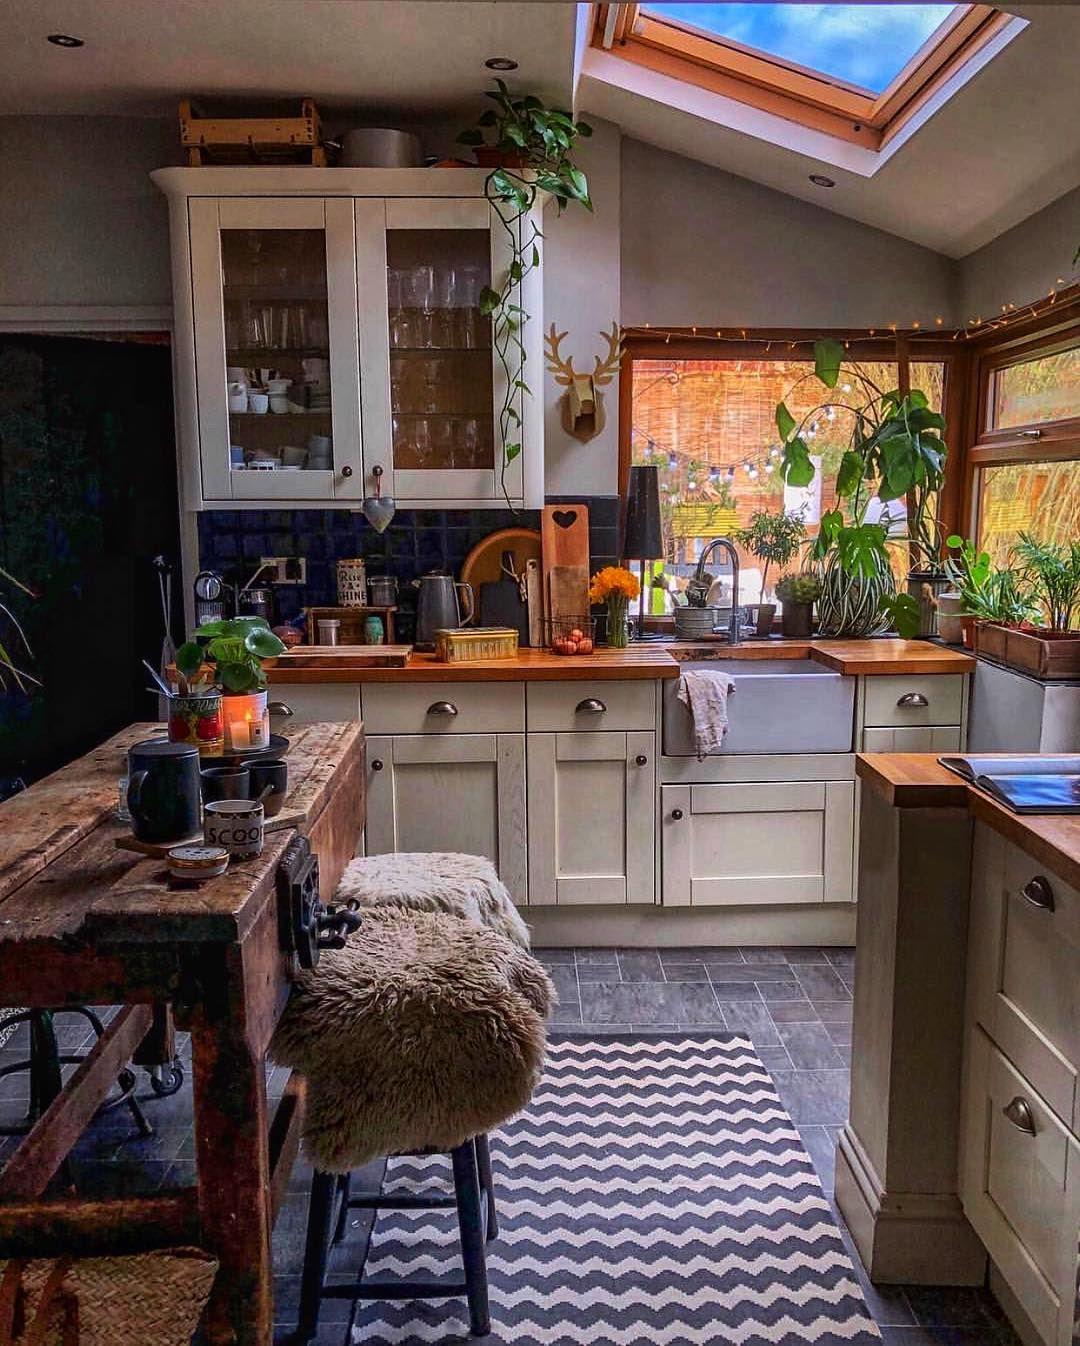 So Much To Love About This Kitchen Cozy Kitchen Home Kitchens Kitchen